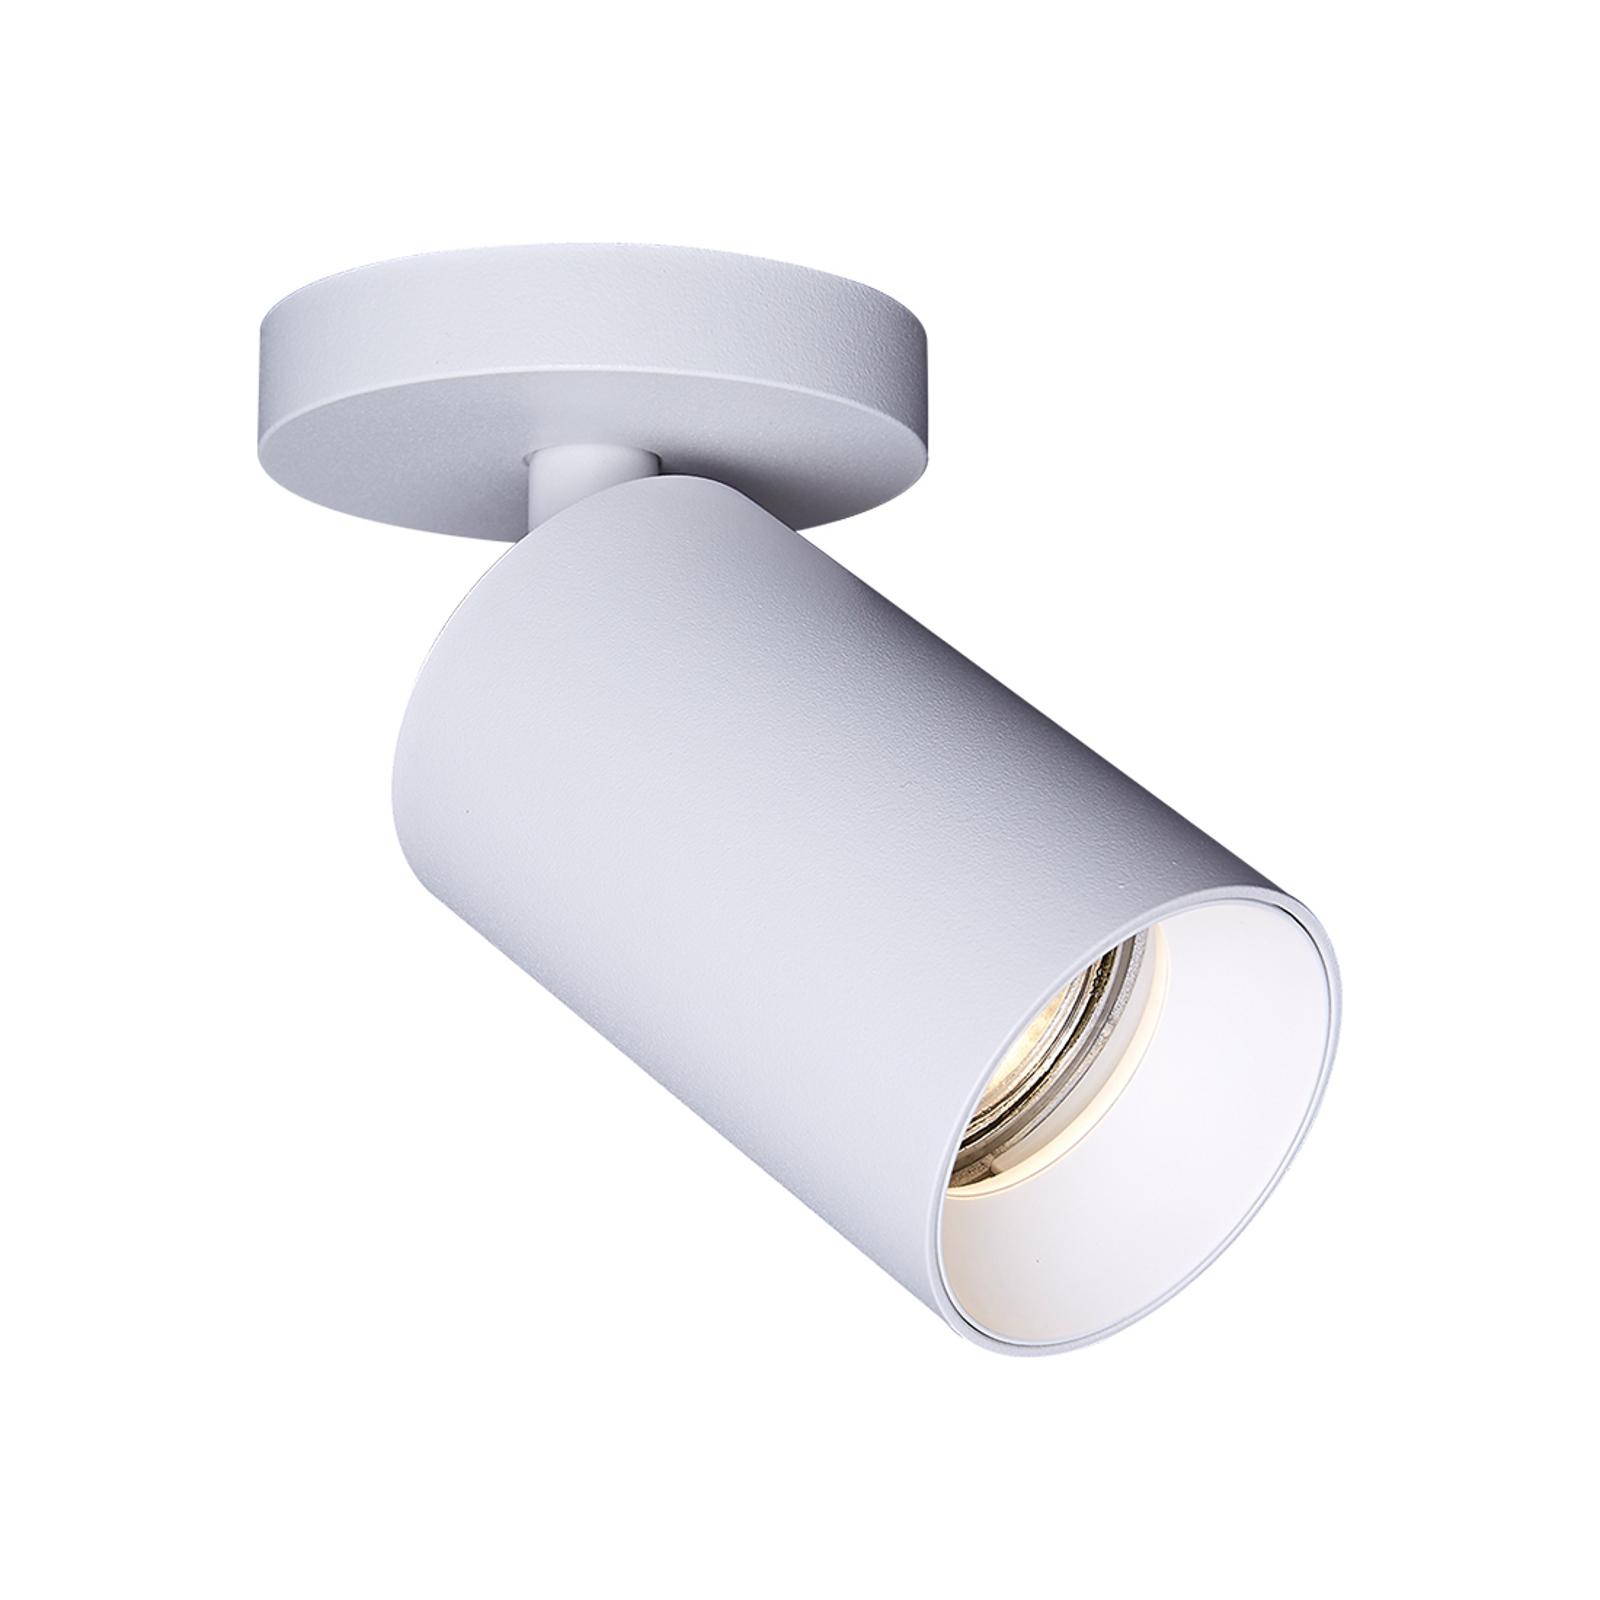 Arcchio Ipega lyskaster, 1 lyskilde, hvit